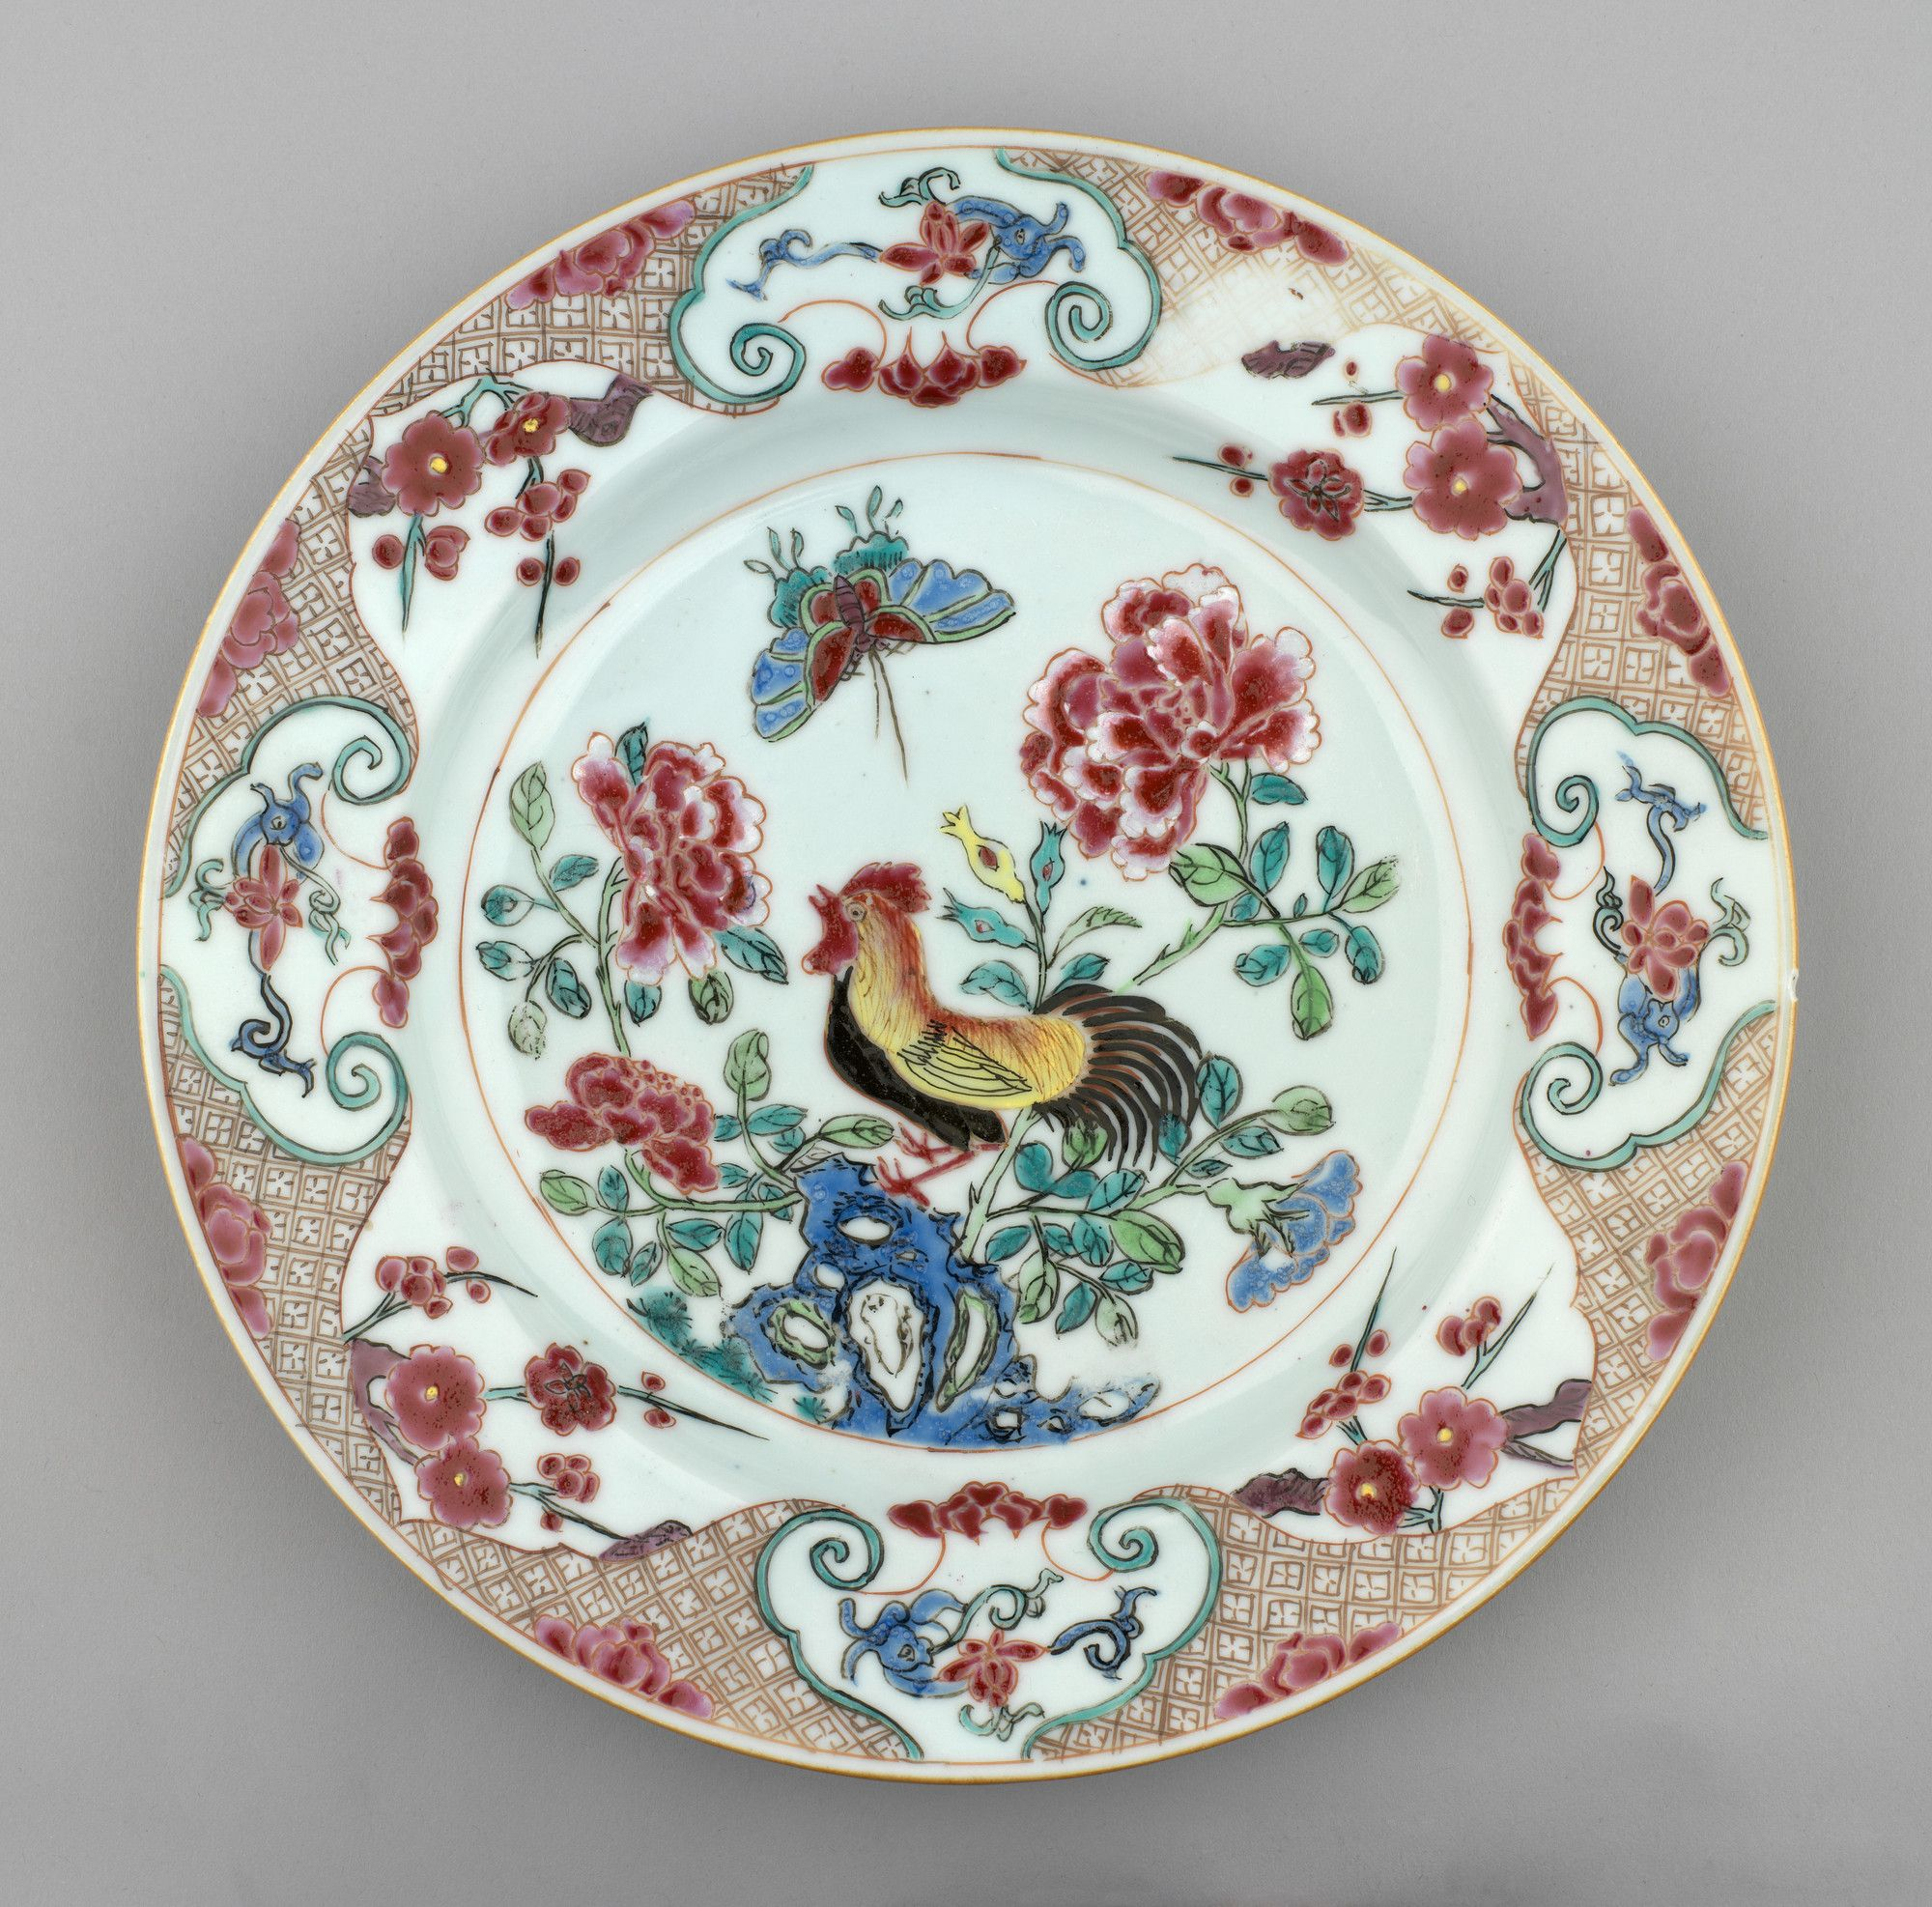 Jingdezhen Porcelain Jiangxi Province China Plate C 1730 1750 Royal Collection Trust Her Majesty Queen Elizabeth Porcellana Vasi Antipasti Di Verdure